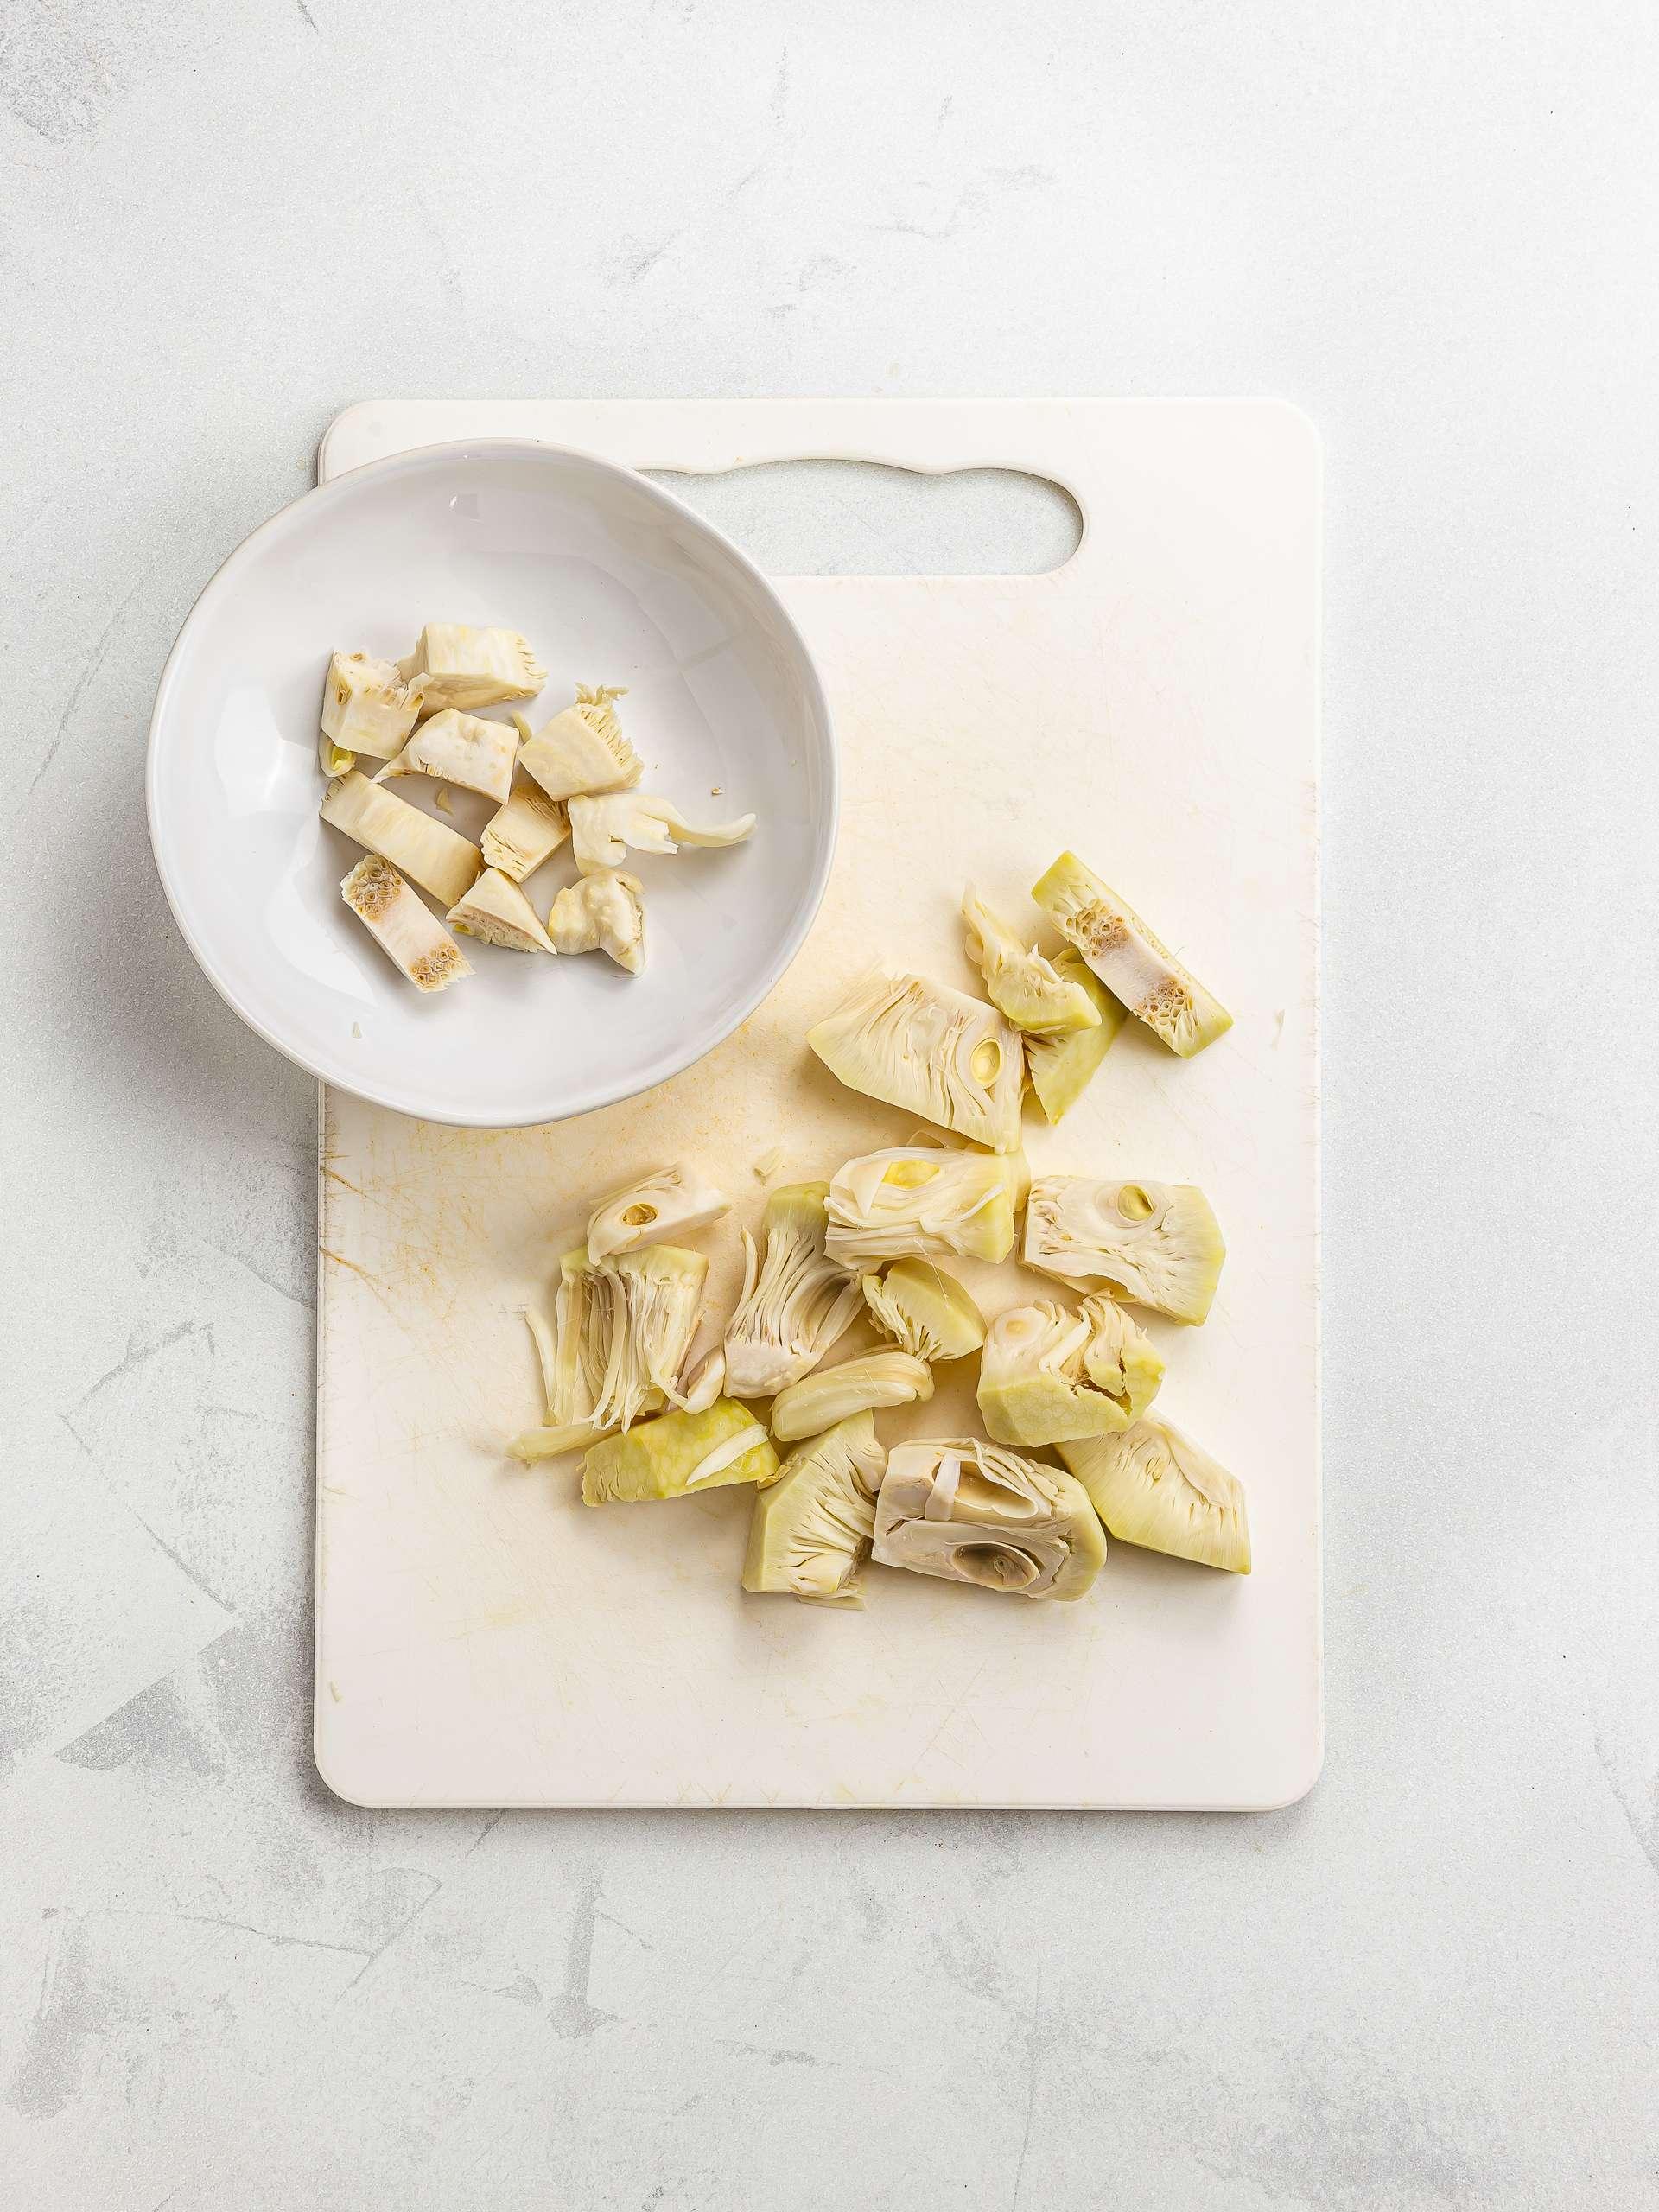 chopped jackfruit